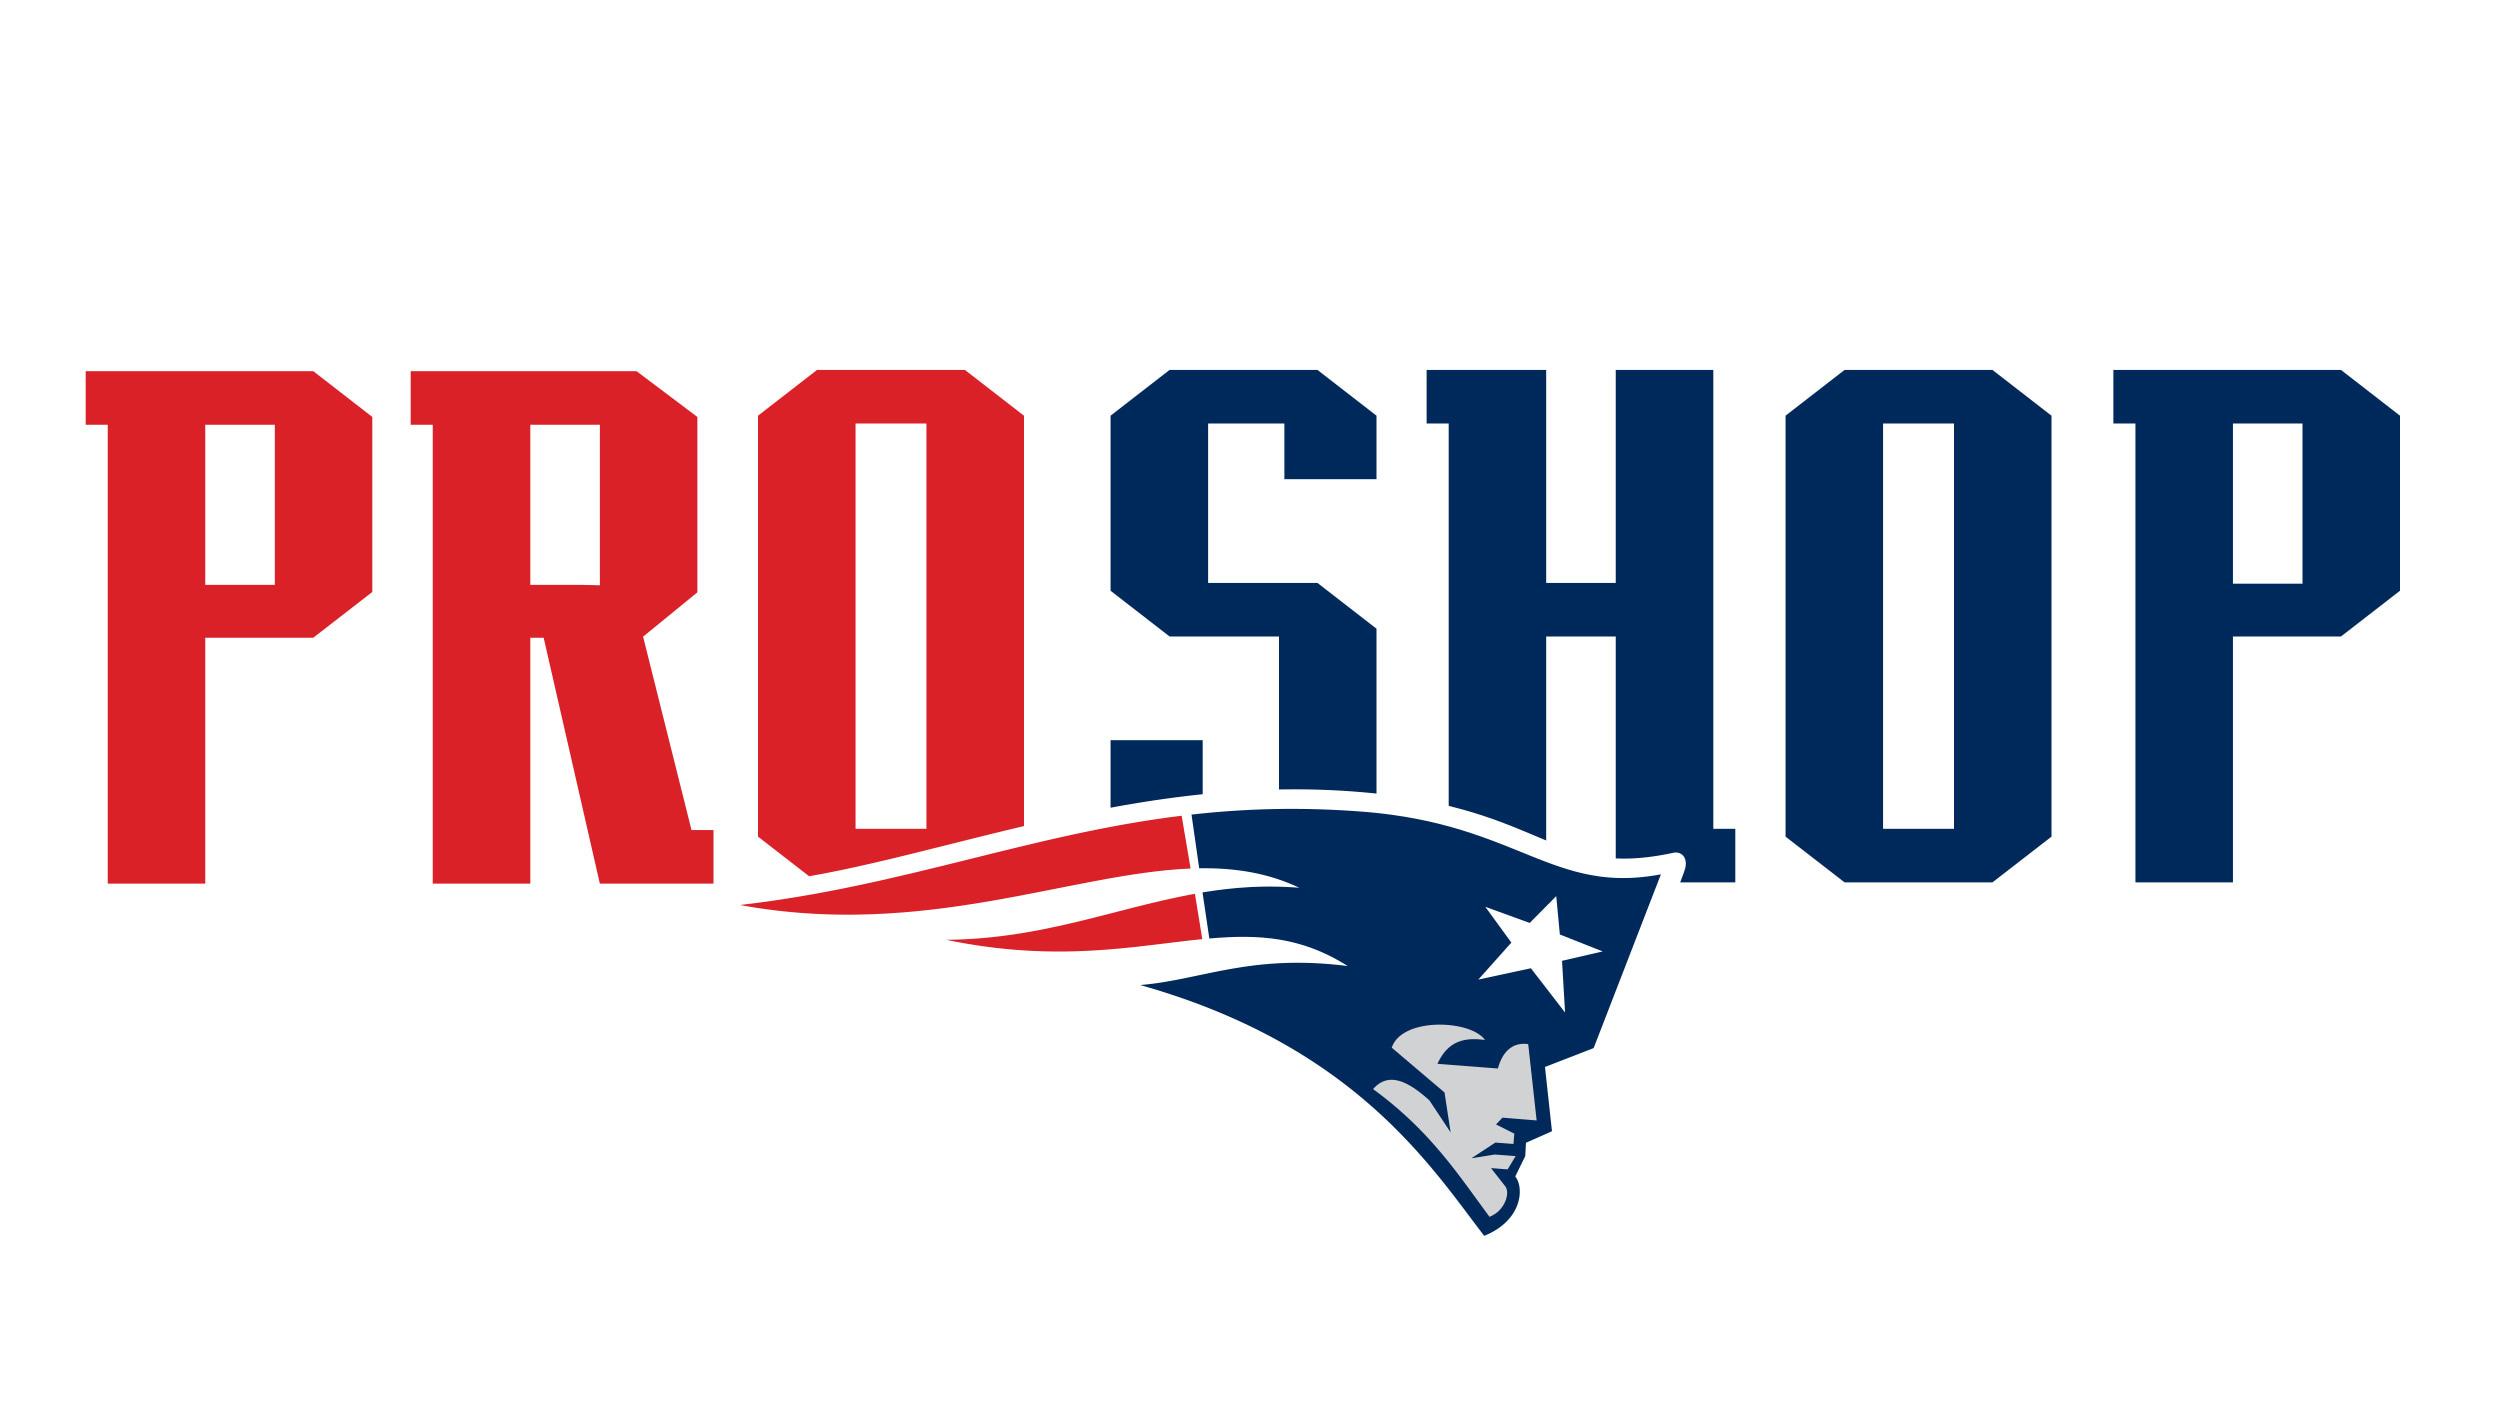 Visit PatriotsProShop.com